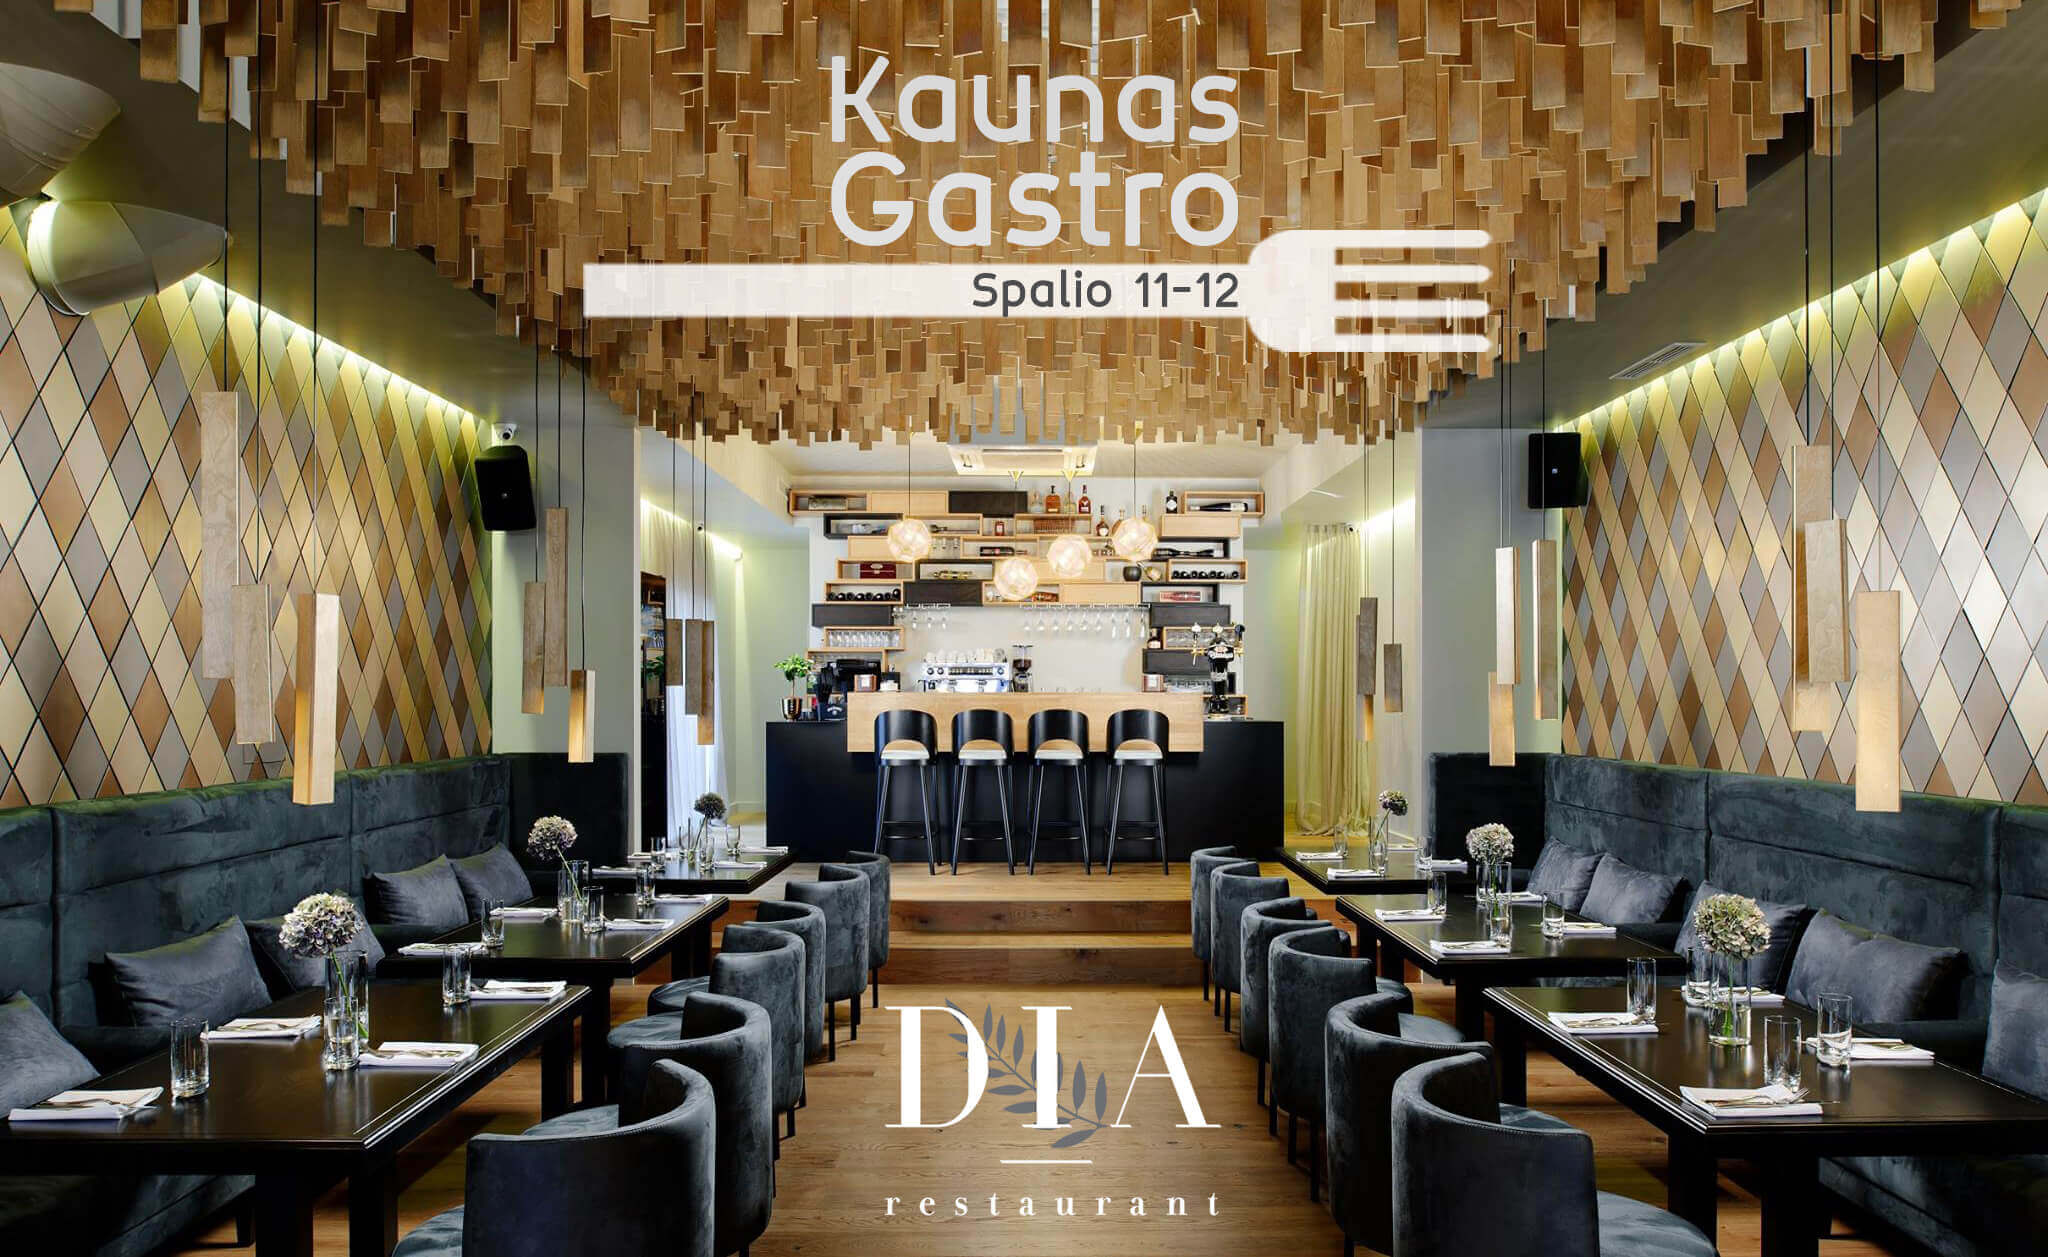 Restoranas DIA